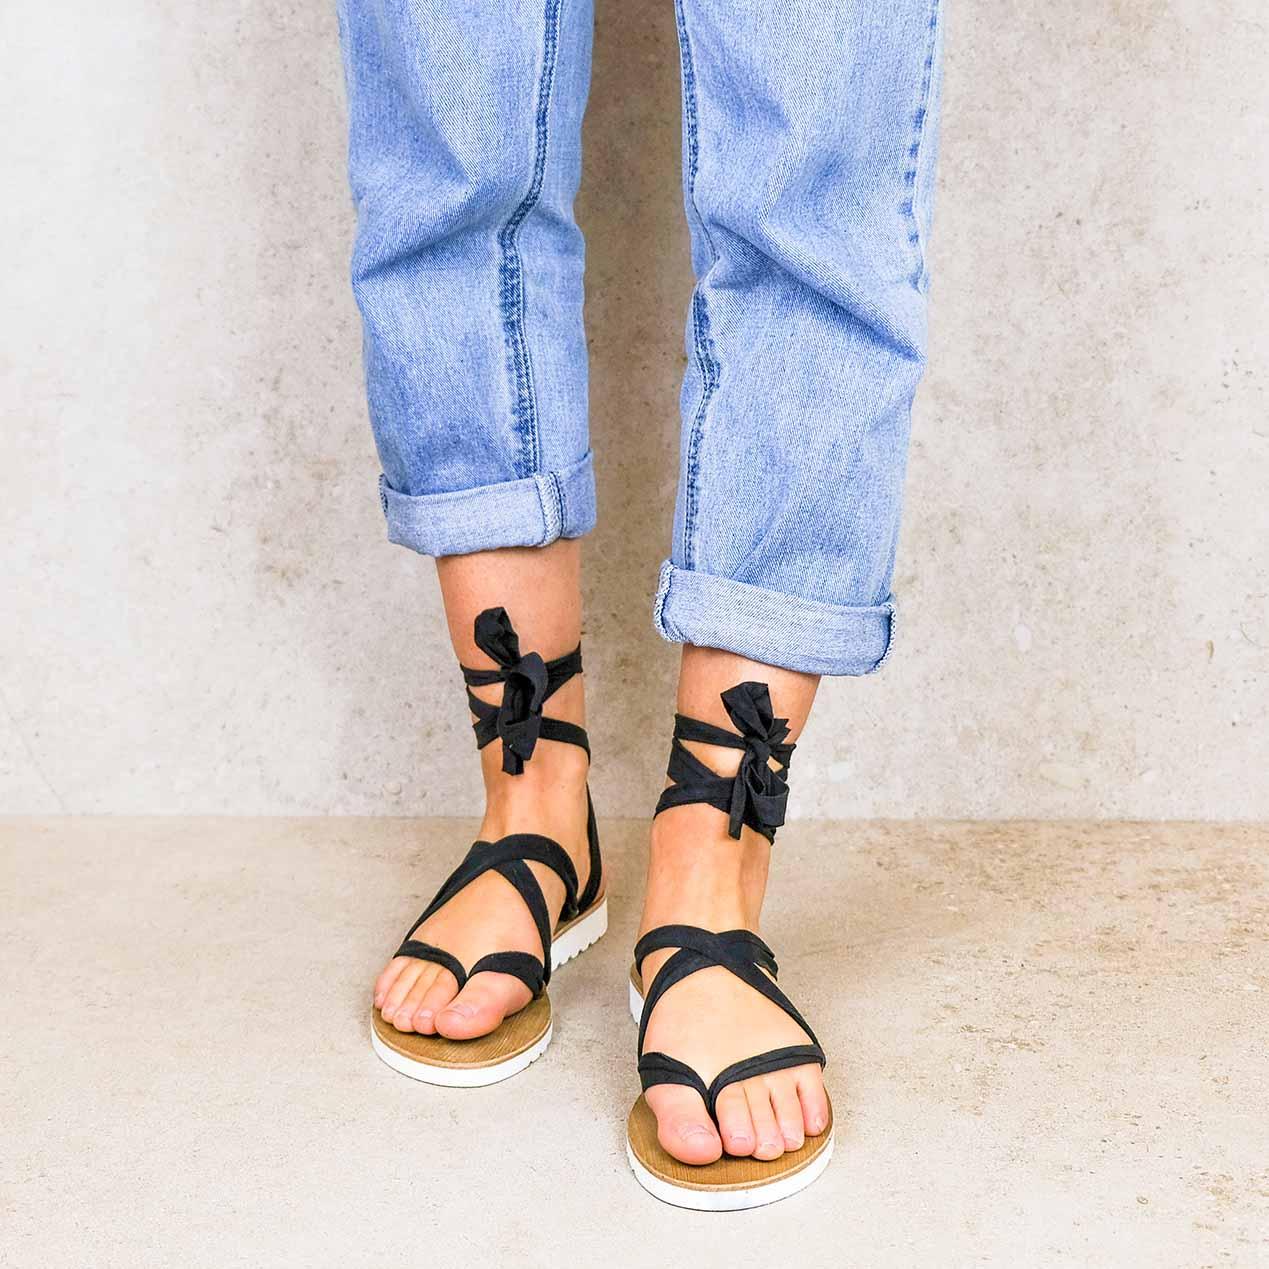 Chalco-lintsandalen sandals travelsandals vegan sustainable sandals wikkelsandalen